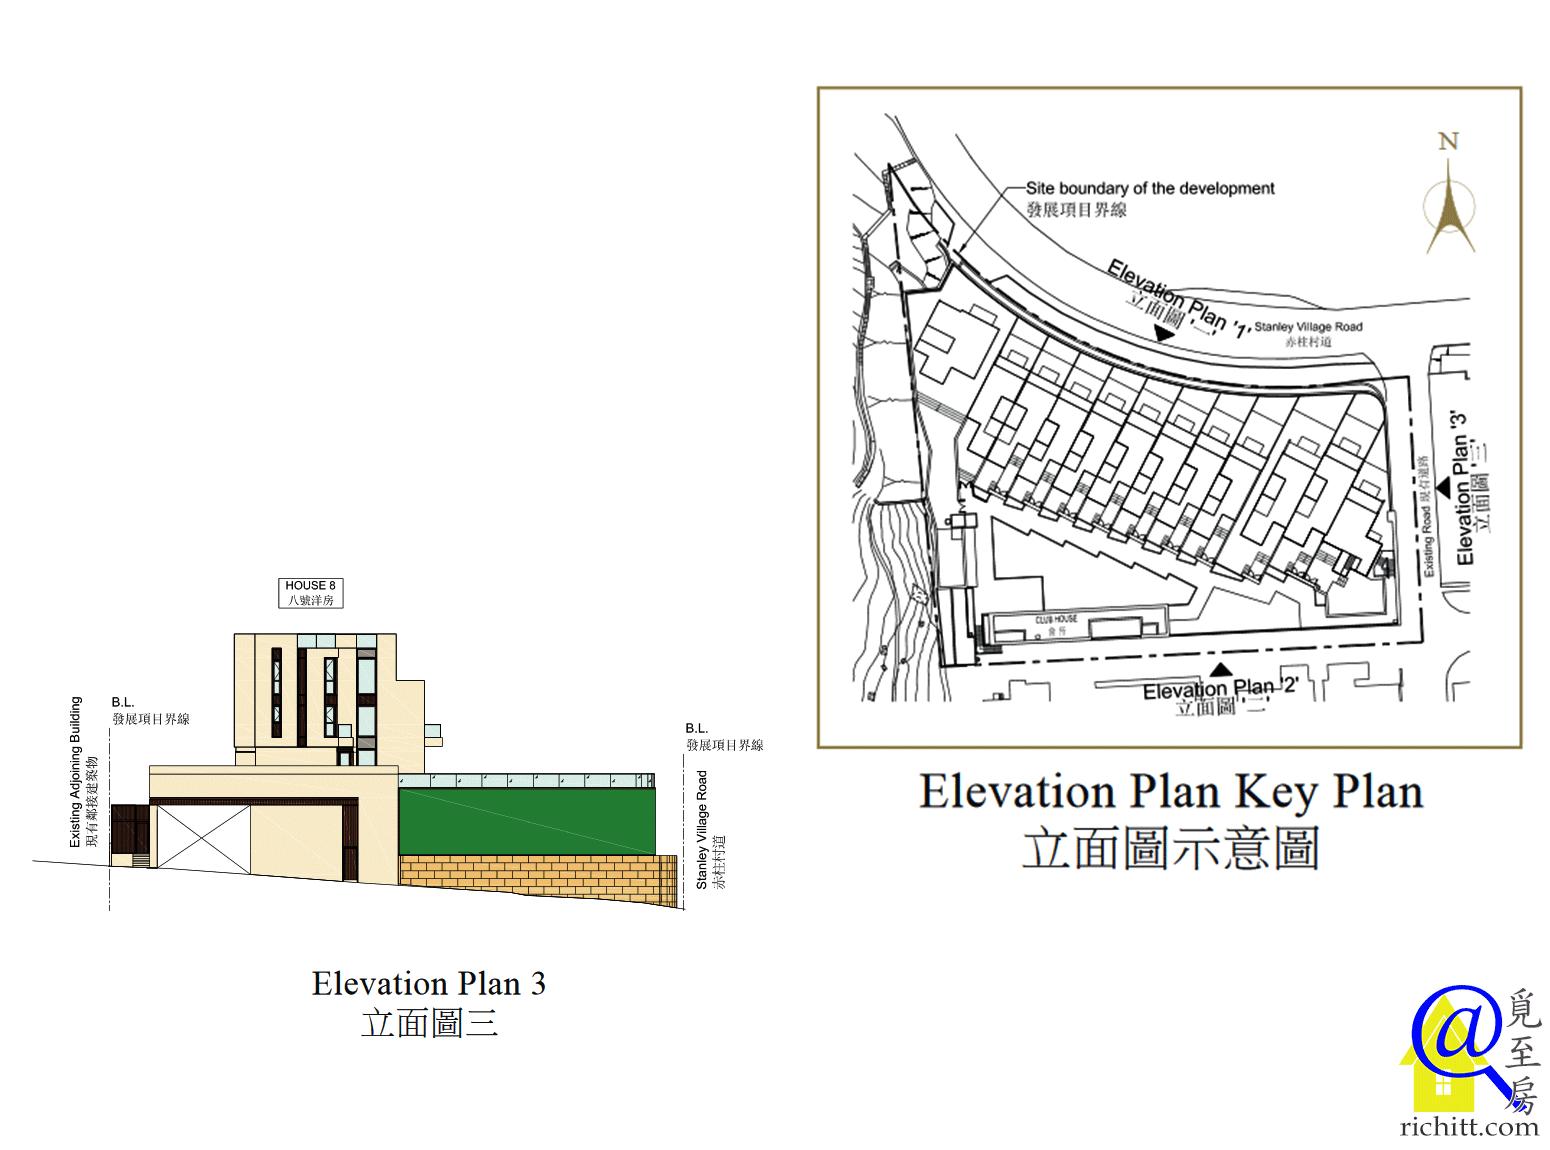 50 STANLEY VILLAGE ROAD 立面圖3及示意圖